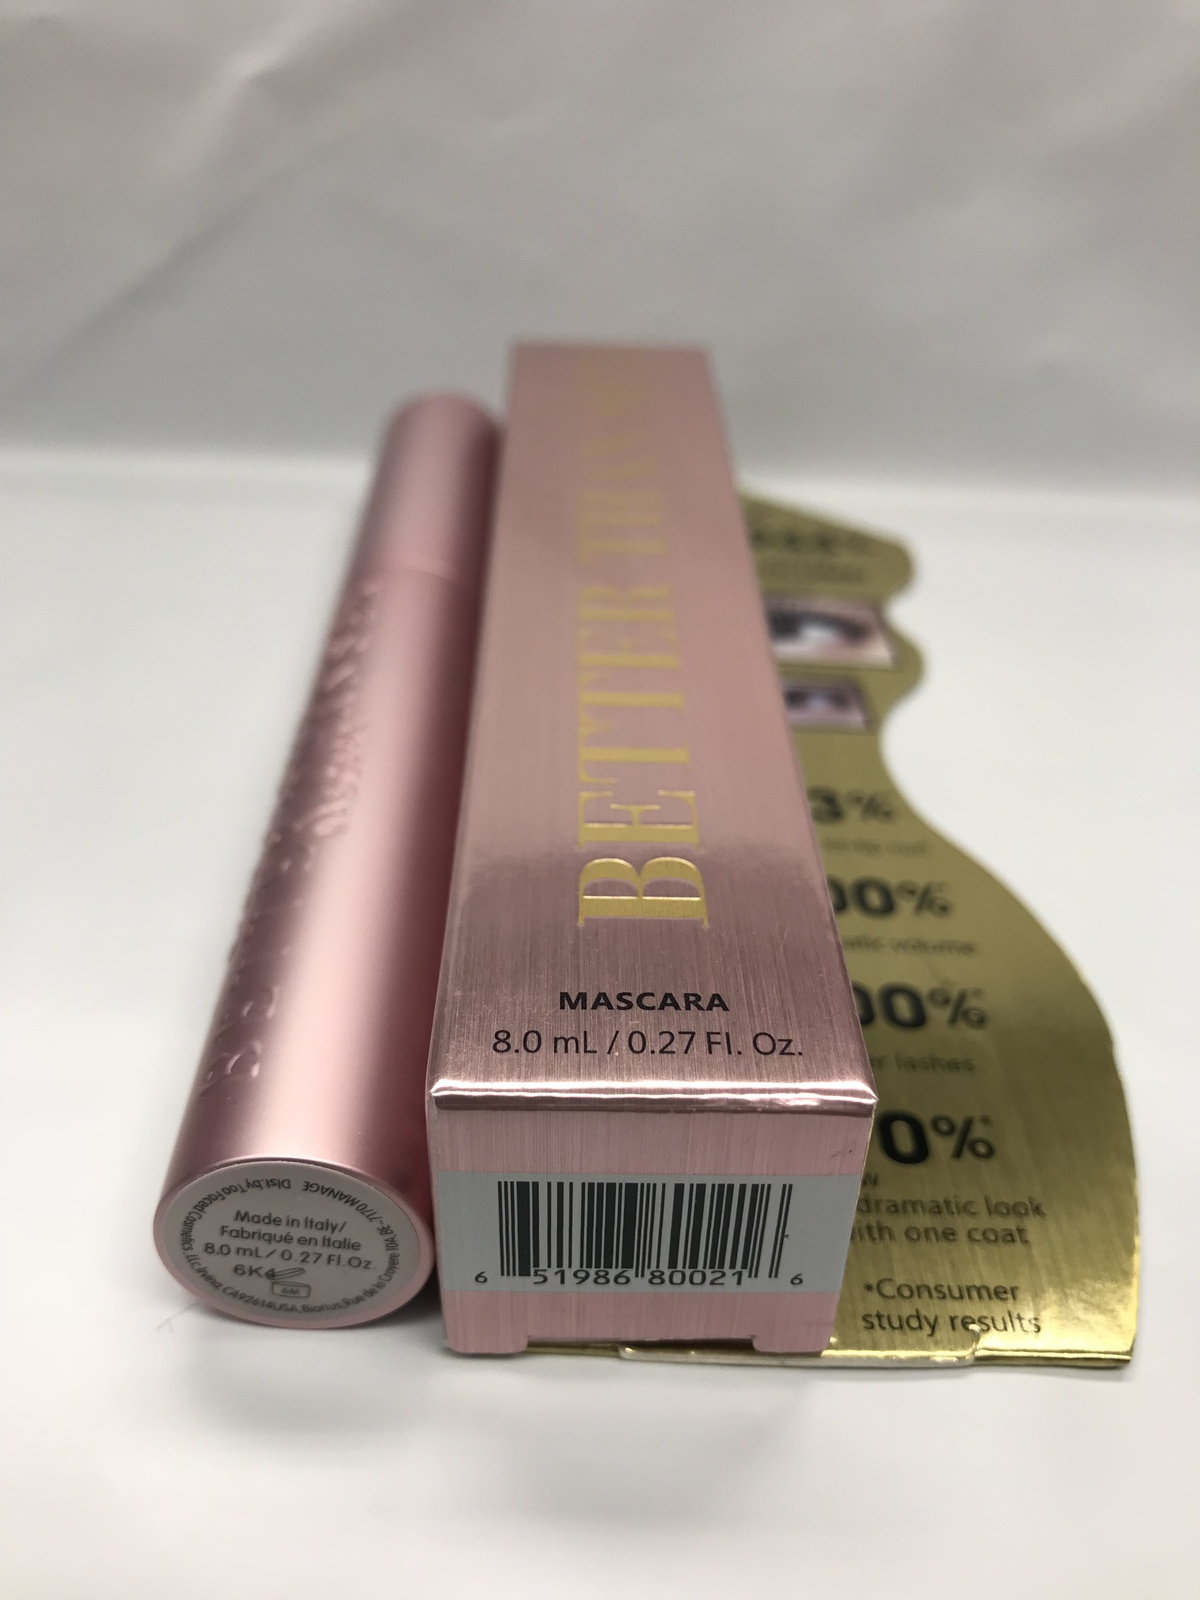 Too Faced - Better Than Sex Mascara, Black- Full Size- 0.27 Fl. Oz BRAND NEW BOX